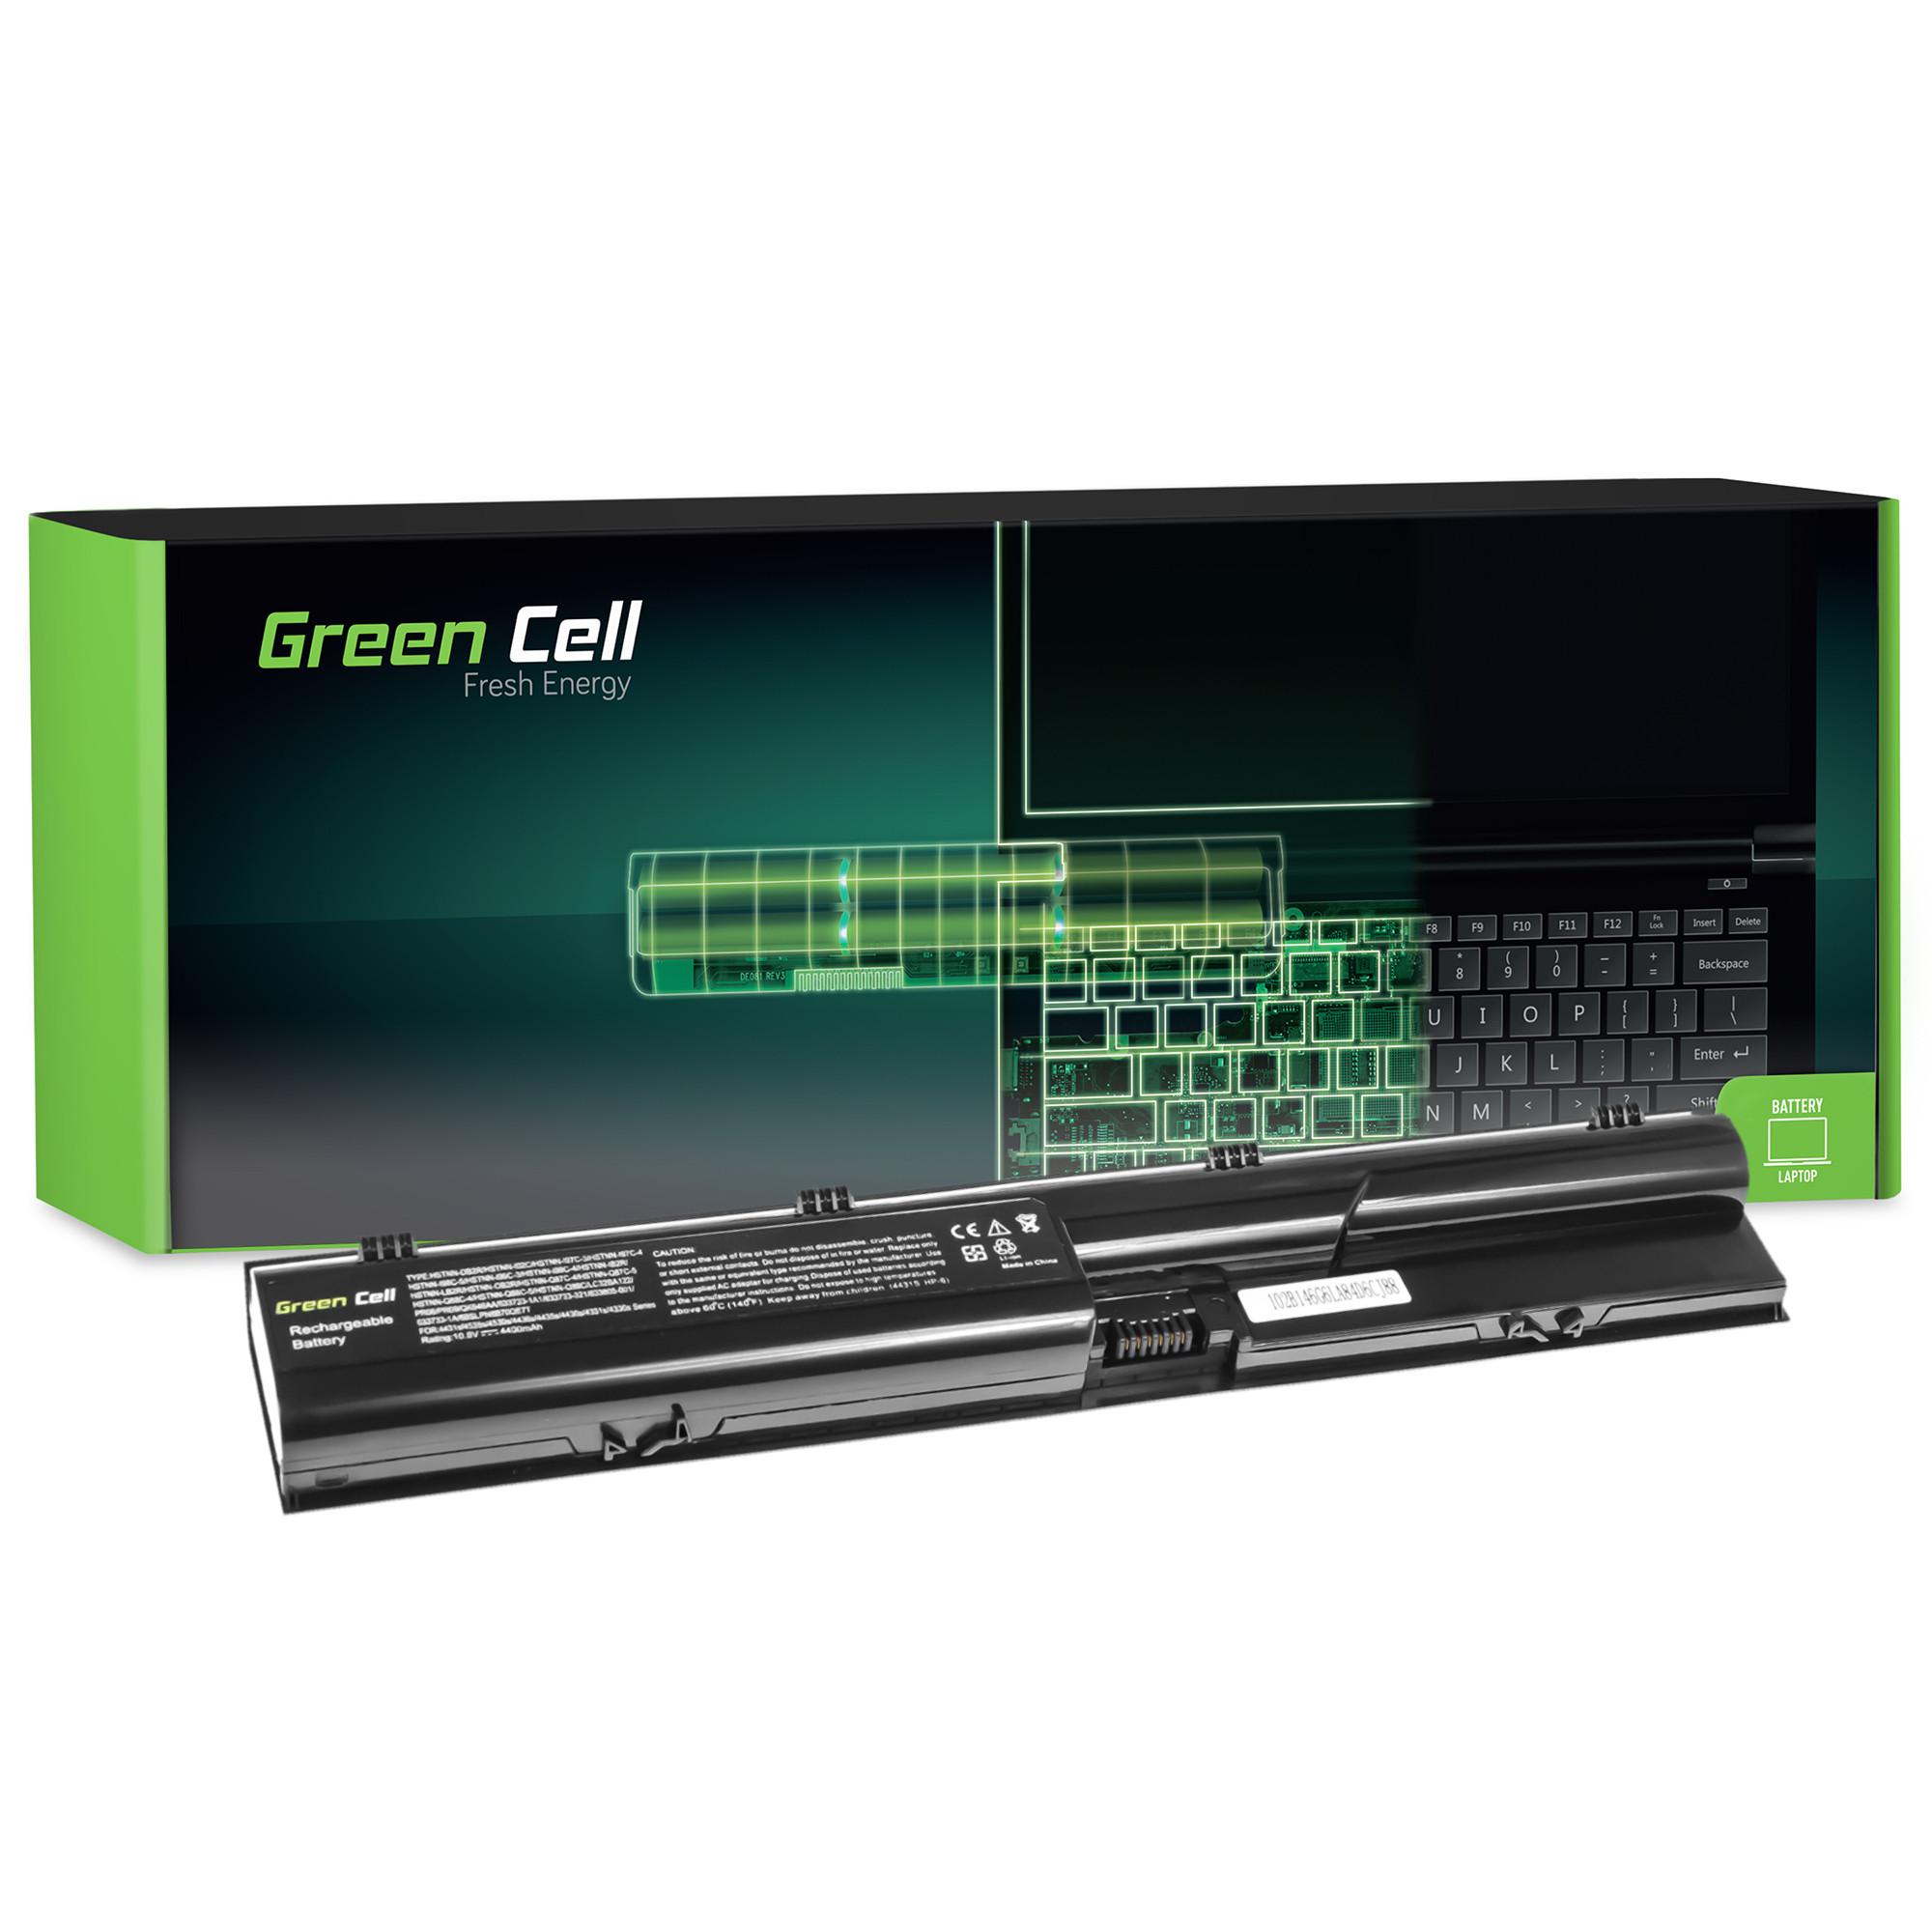 Green Cell HP43 Baterie HP PR06 do HP Probook 4330s 4430s 4440s 4530s 4540s 4400mAh Li-ion - neoriginální